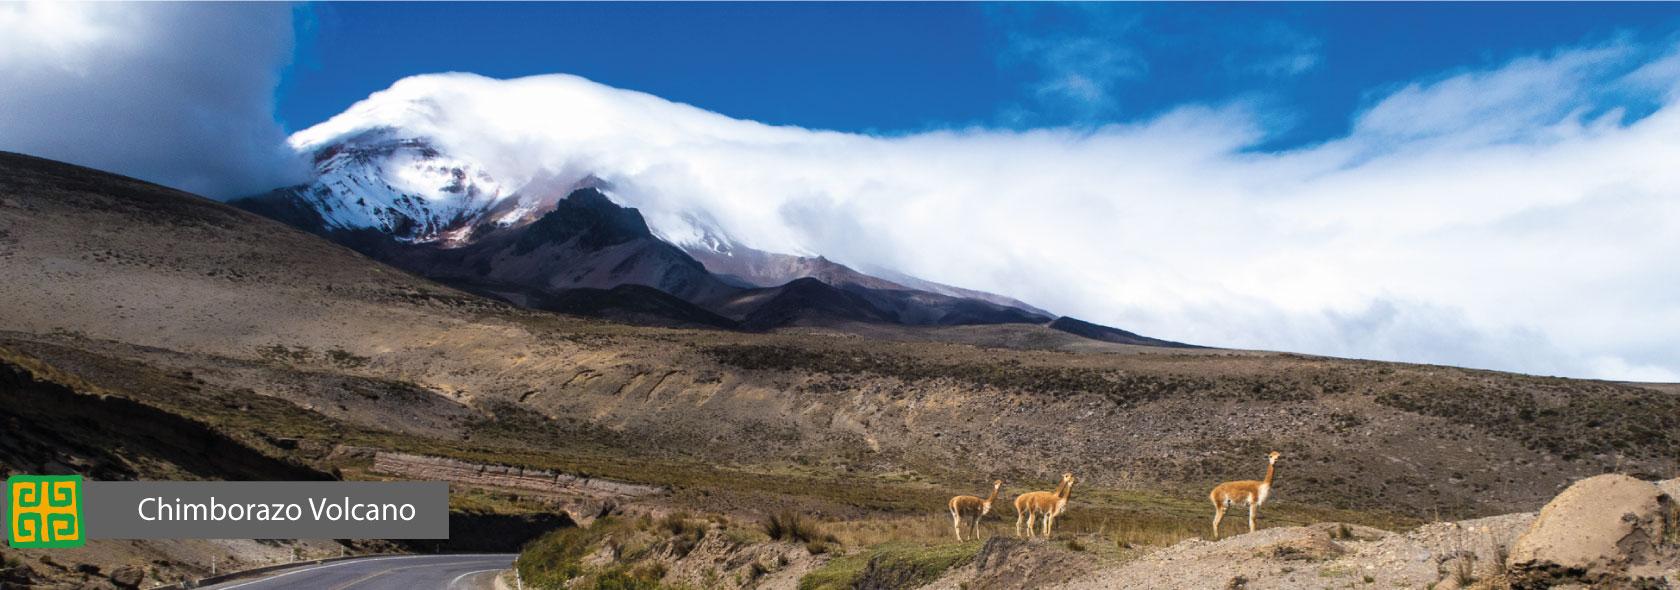 Chimborazo-Volcano